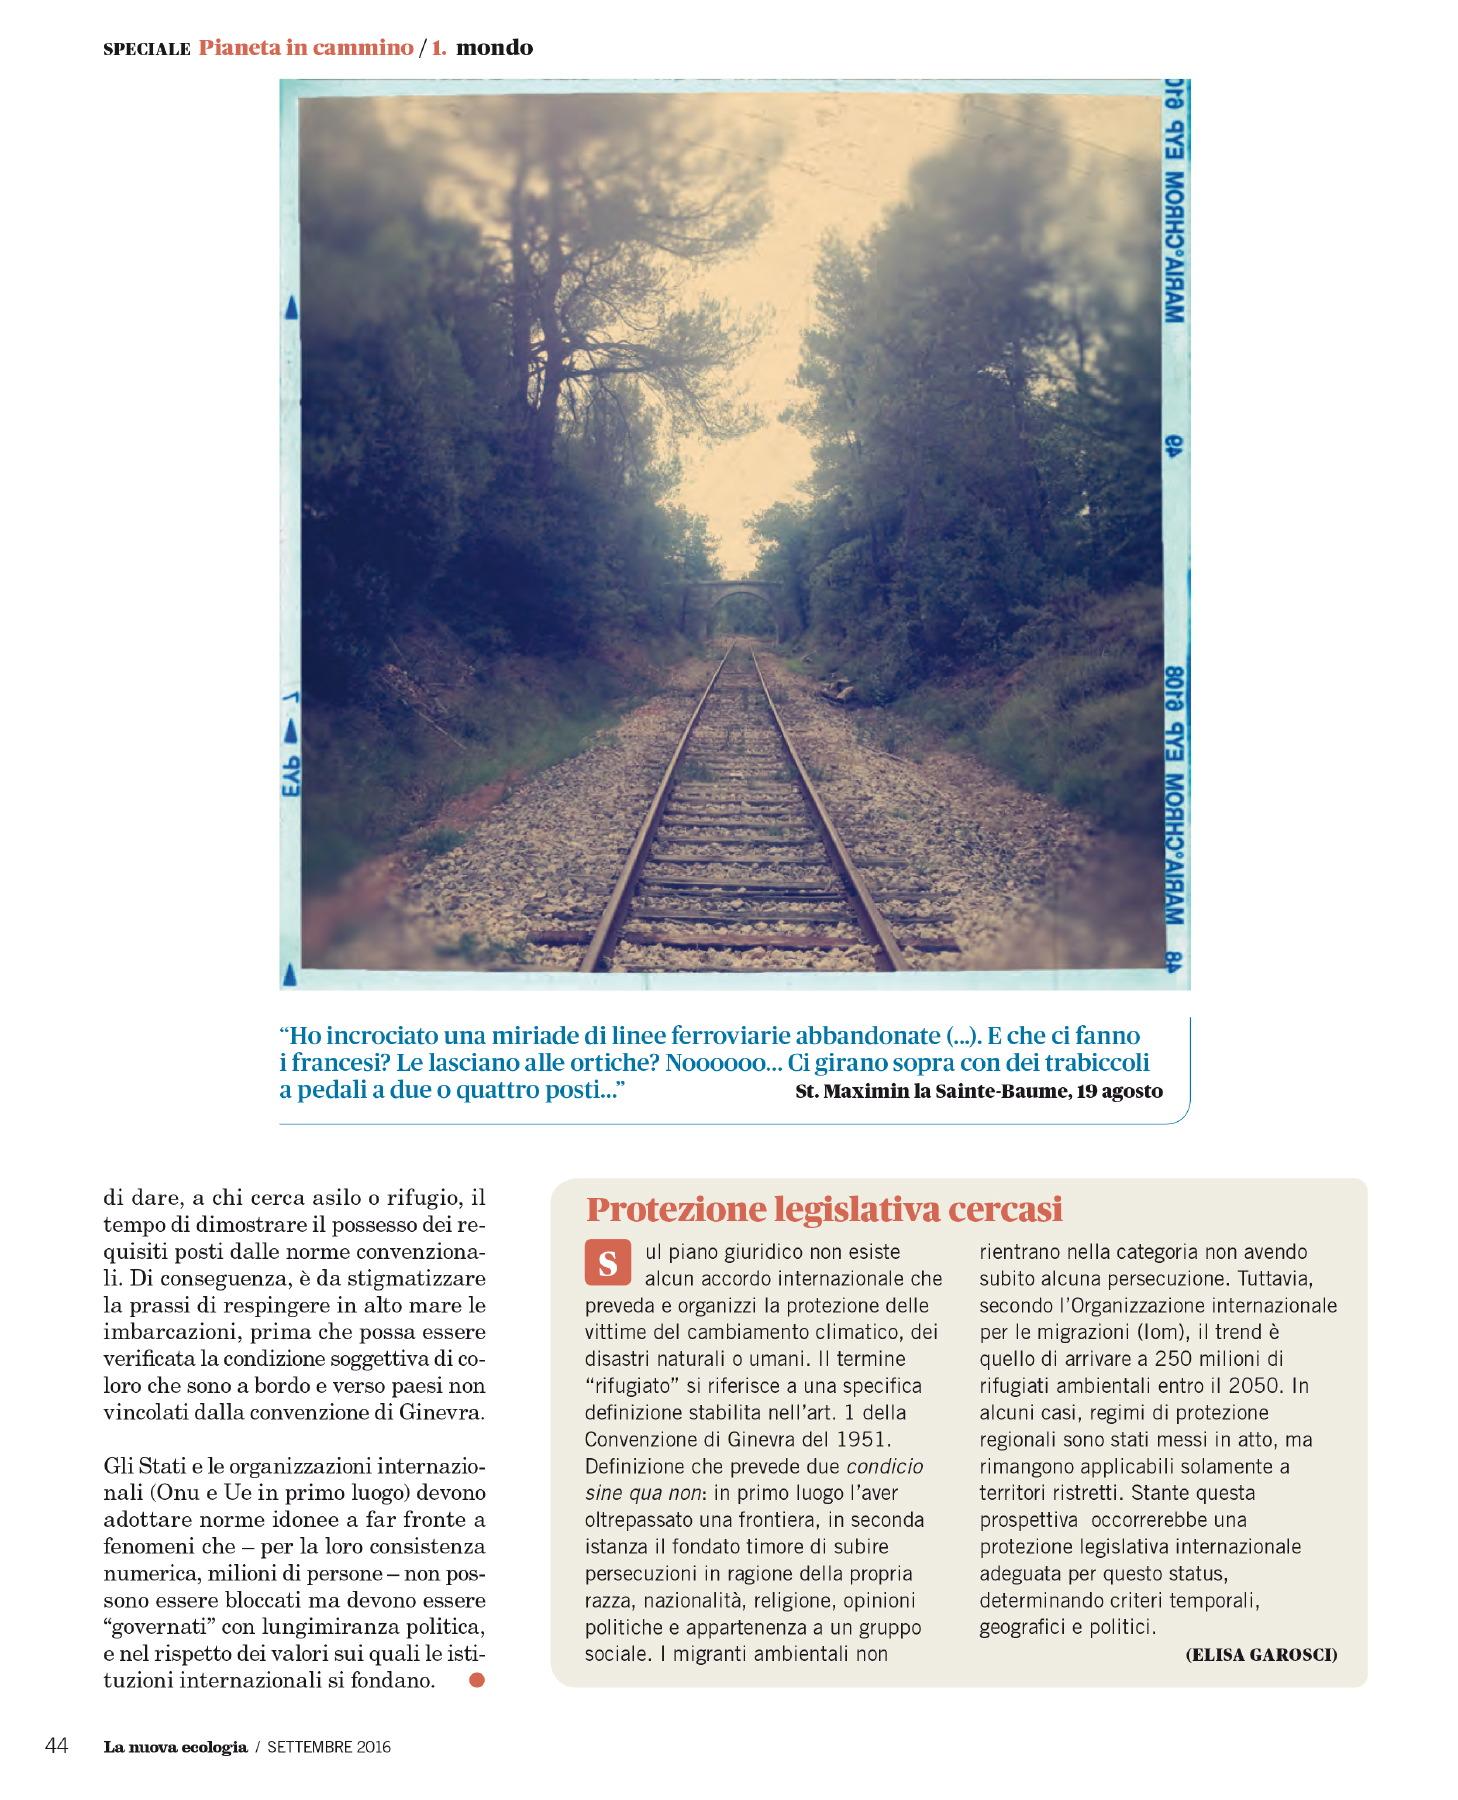 around-the-walk-_-pietro-vertamy-_tearsheet-nuova-ecologia-04